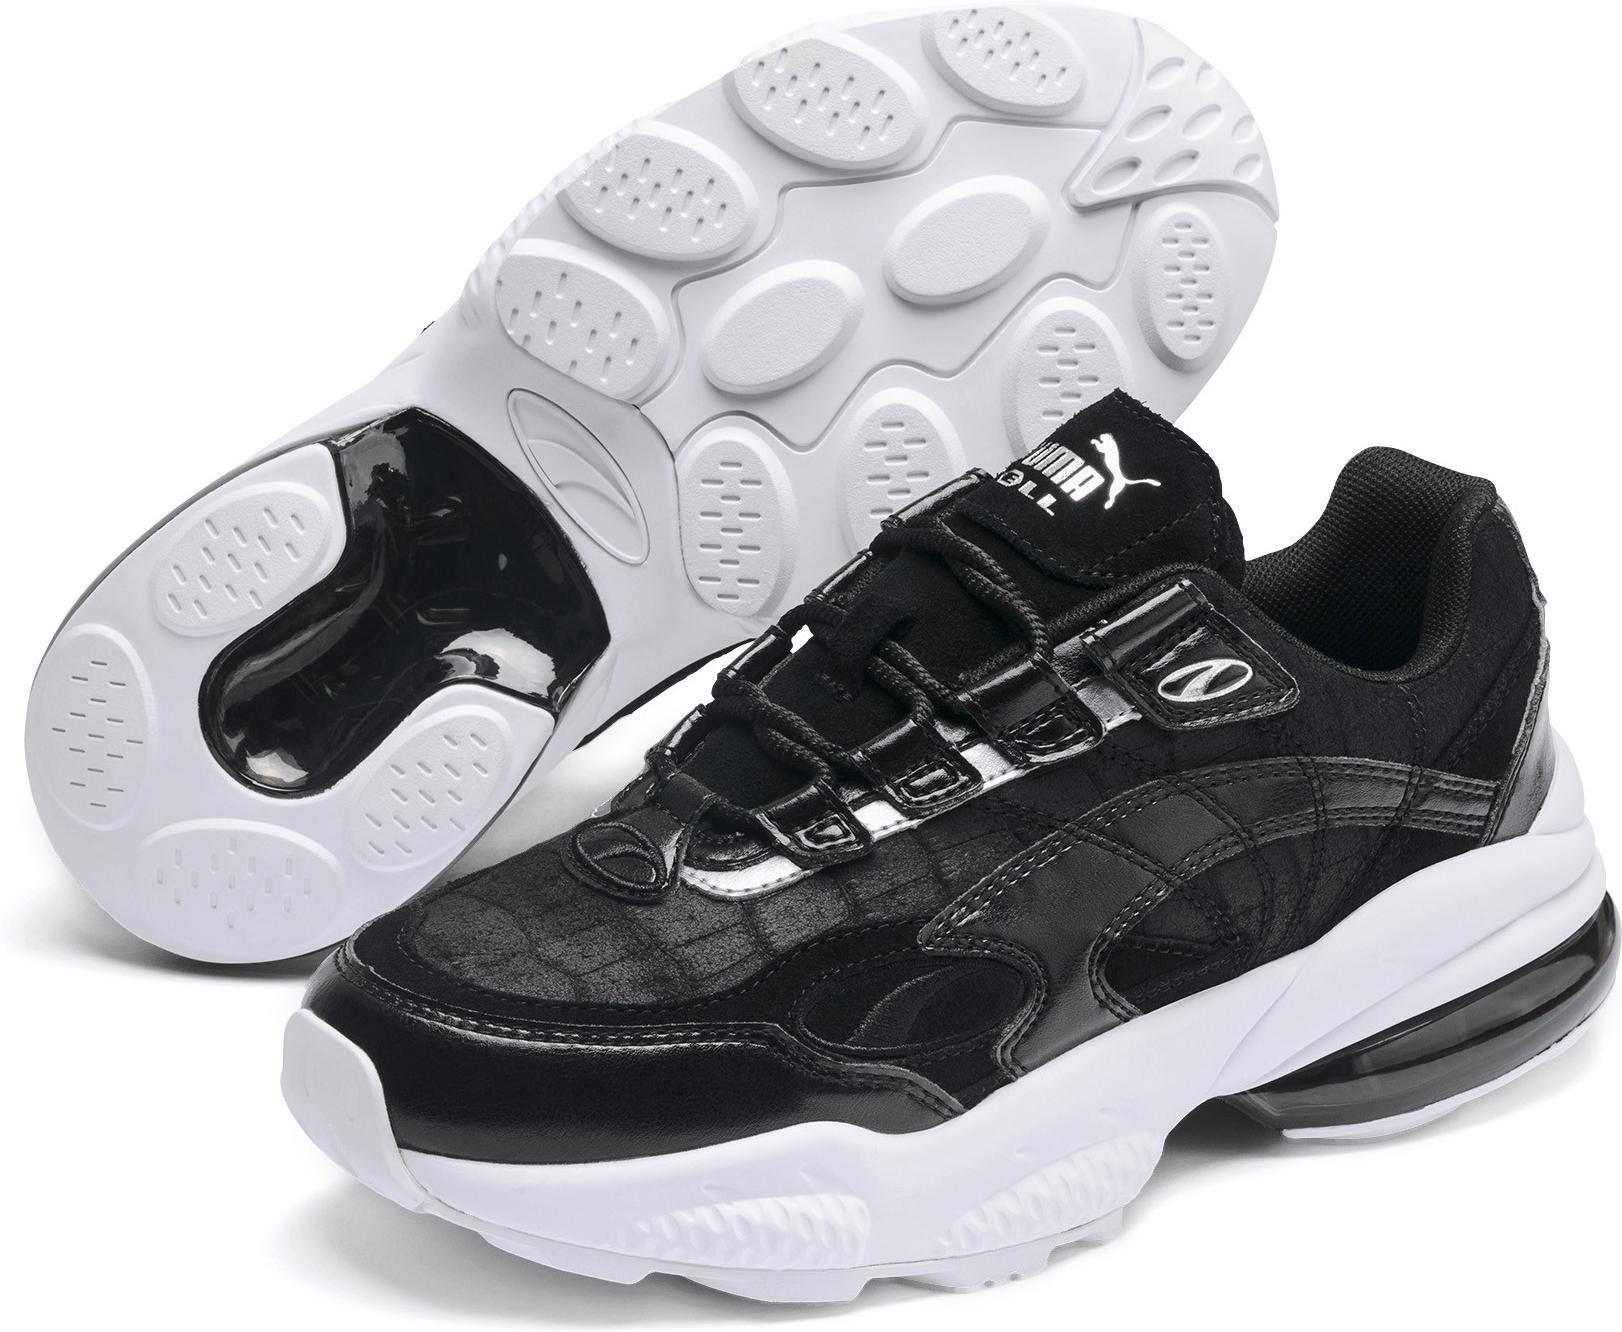 padrona camuffare convergenza  Shoes Puma Cell Venom Hypertech Wn s - Top4Running.com